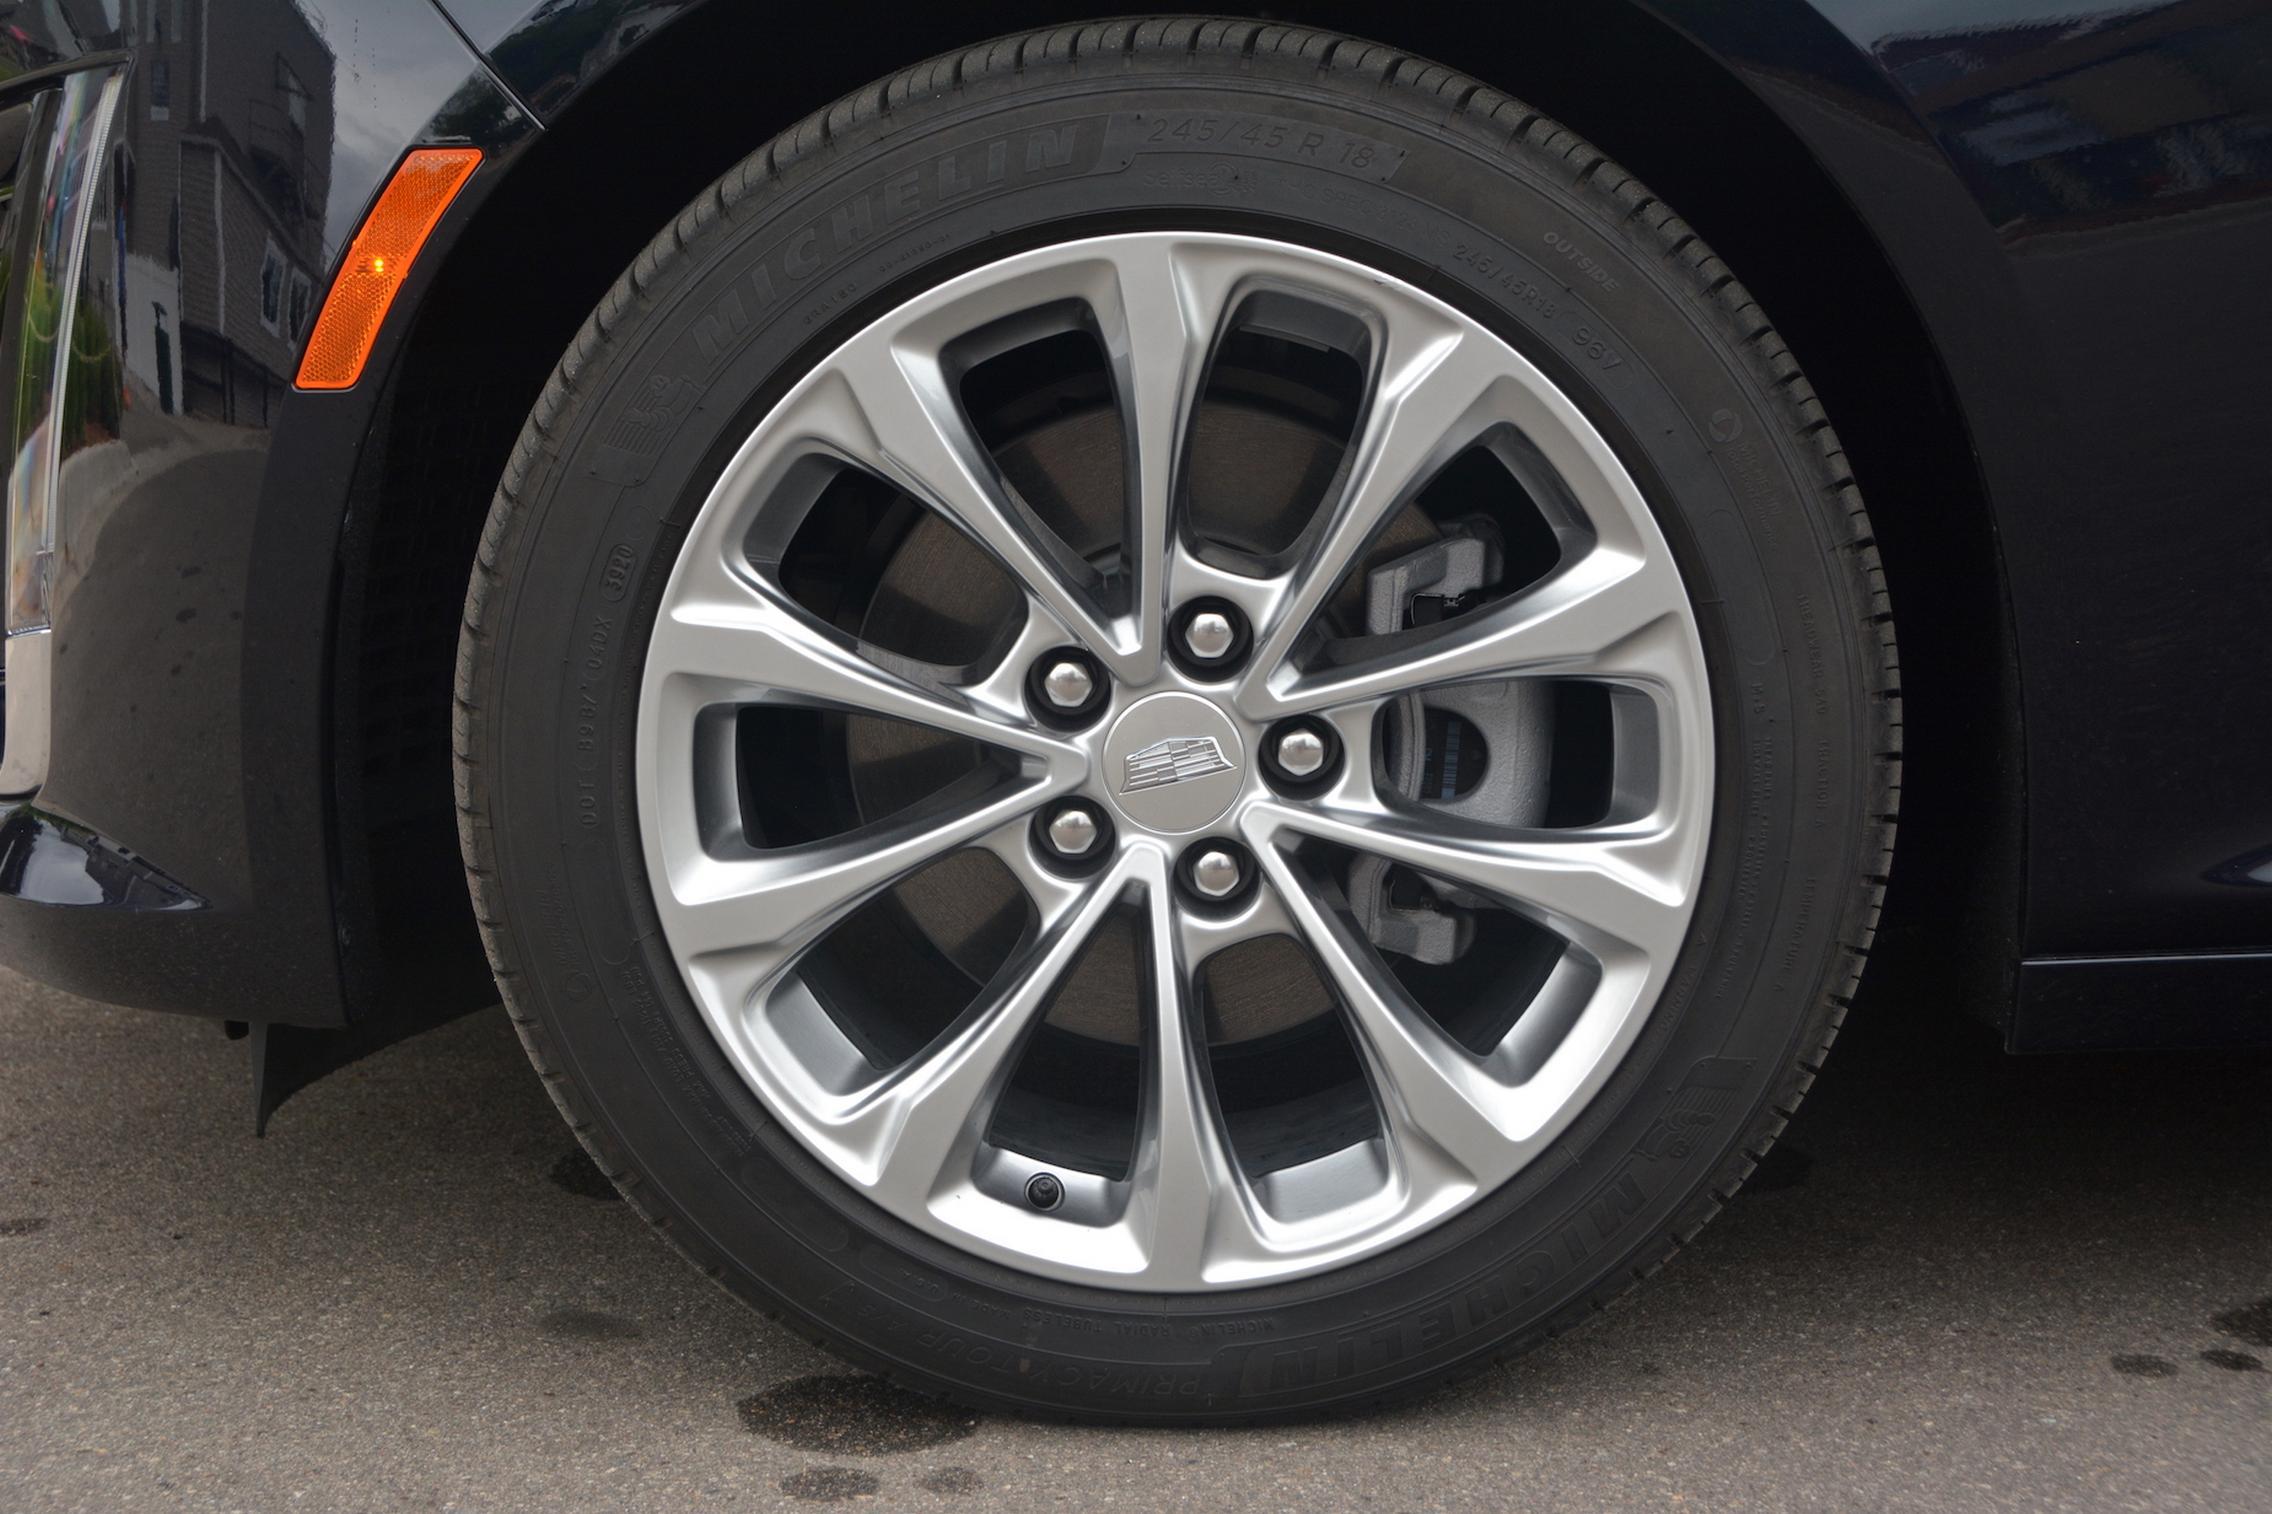 2021 Cadillac CT5 wheels